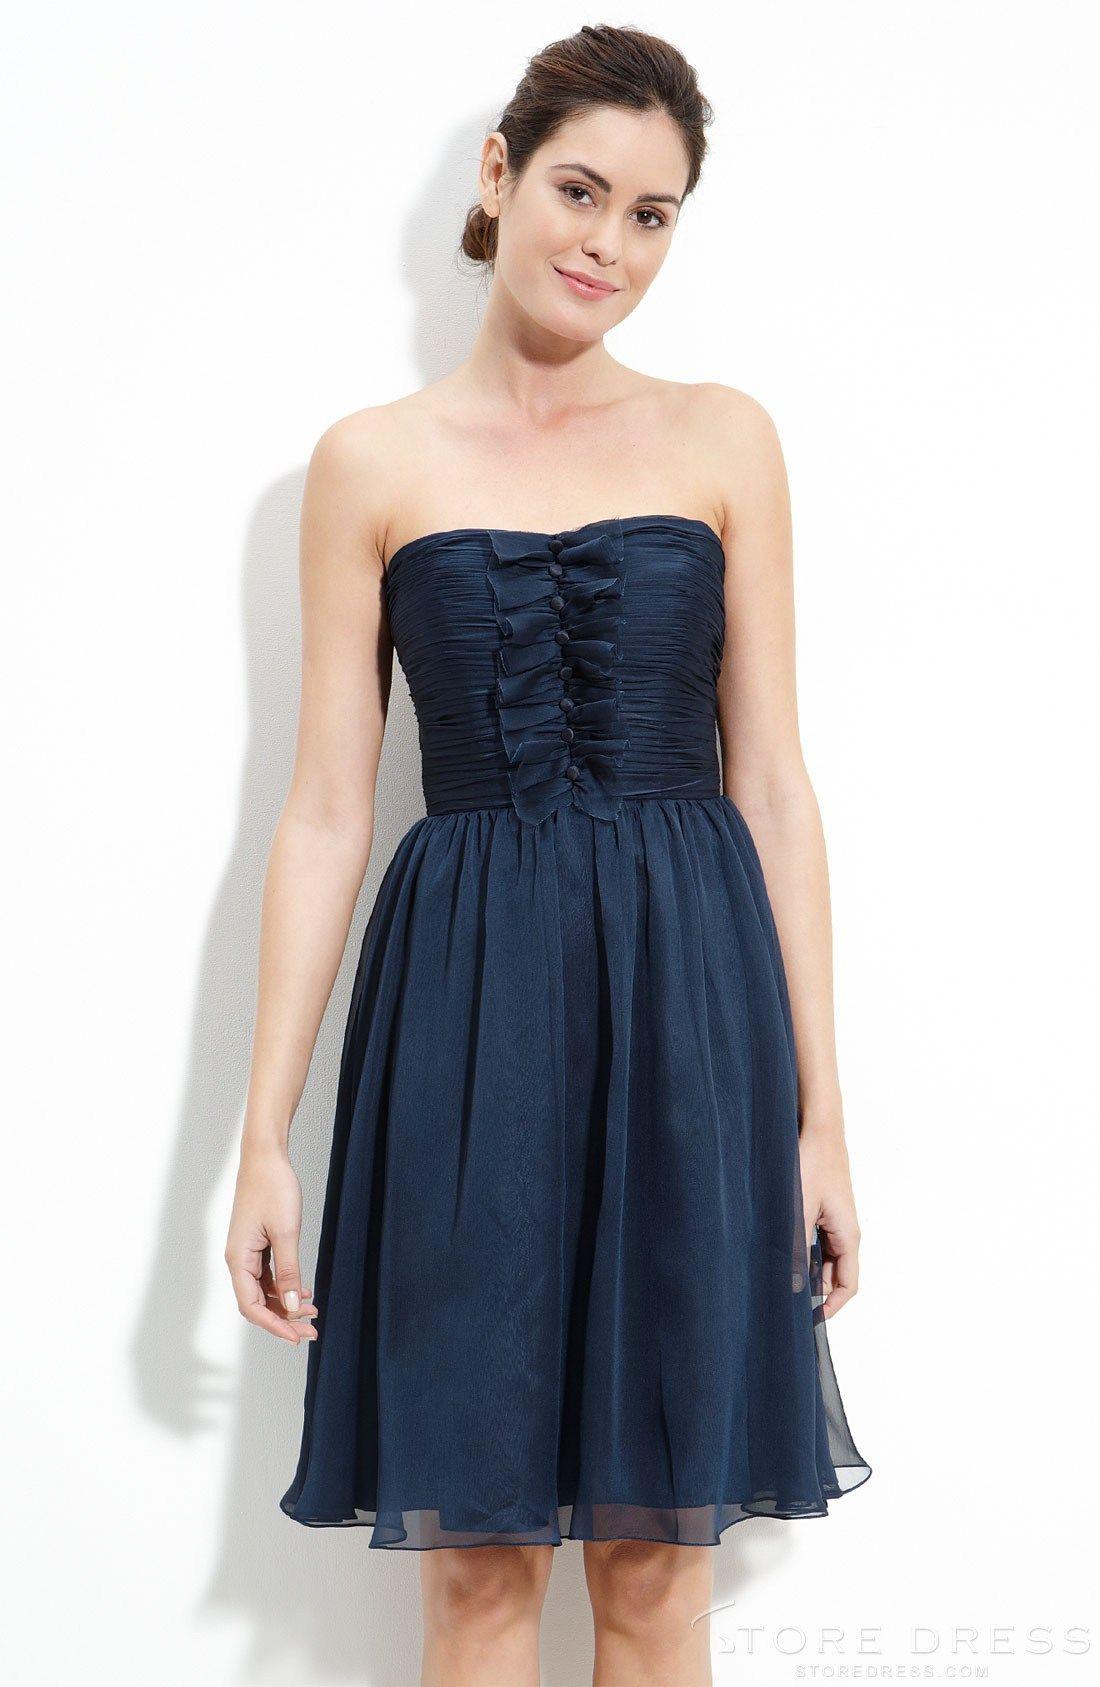 Gorgeous Sheath / Column Strapless Knee-length Bridesmaid Dress at Storedress.com